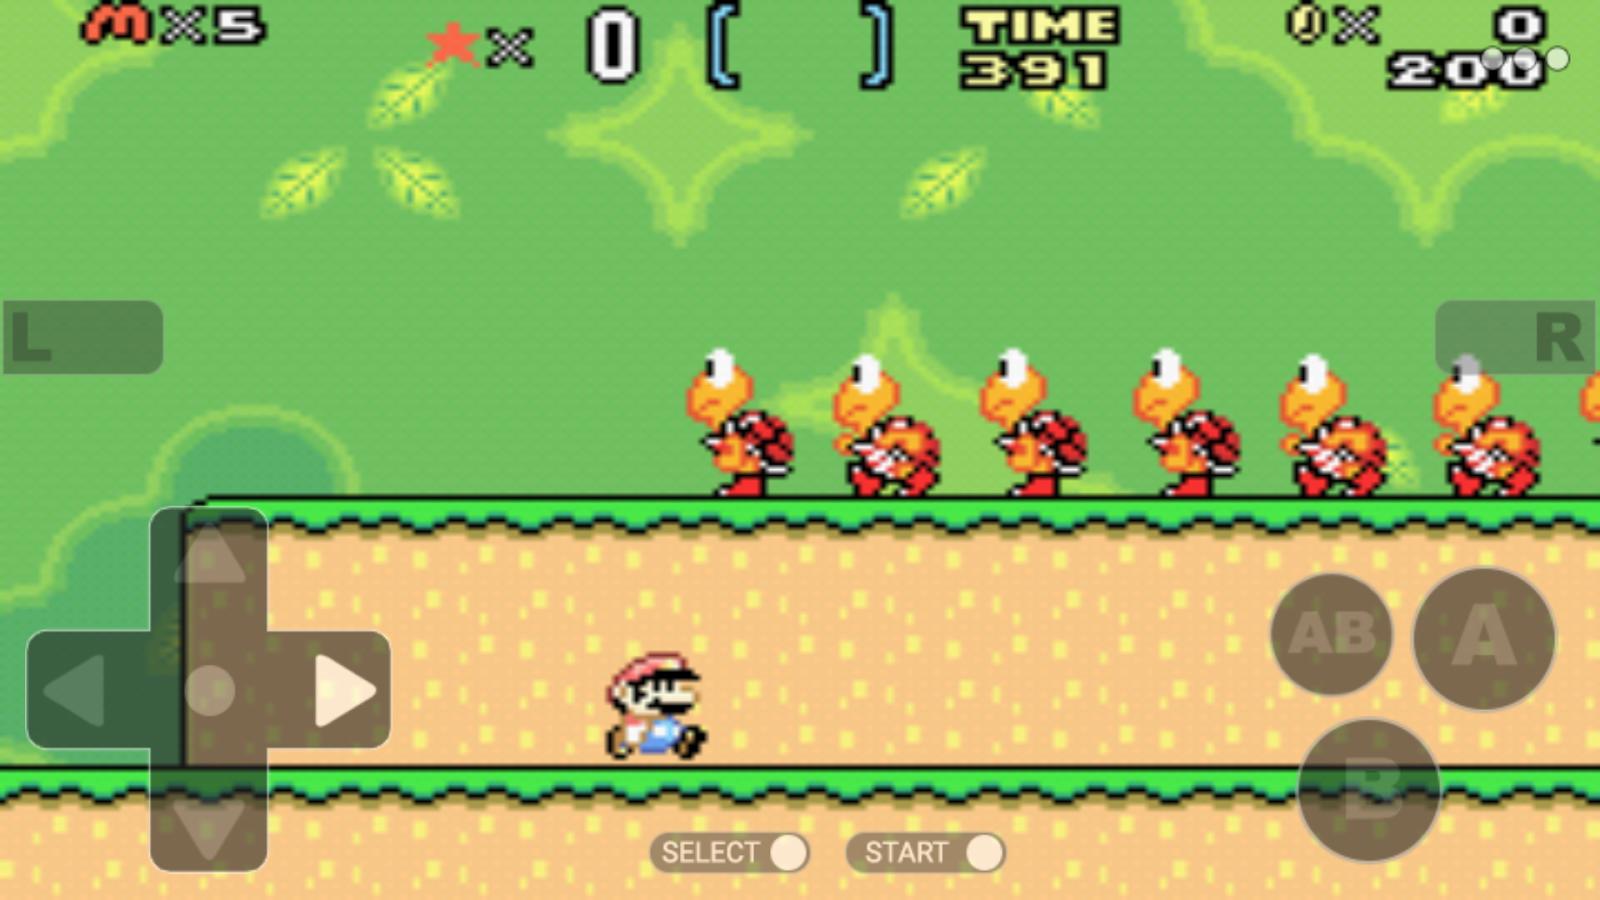 classic boy emulator full version apk free